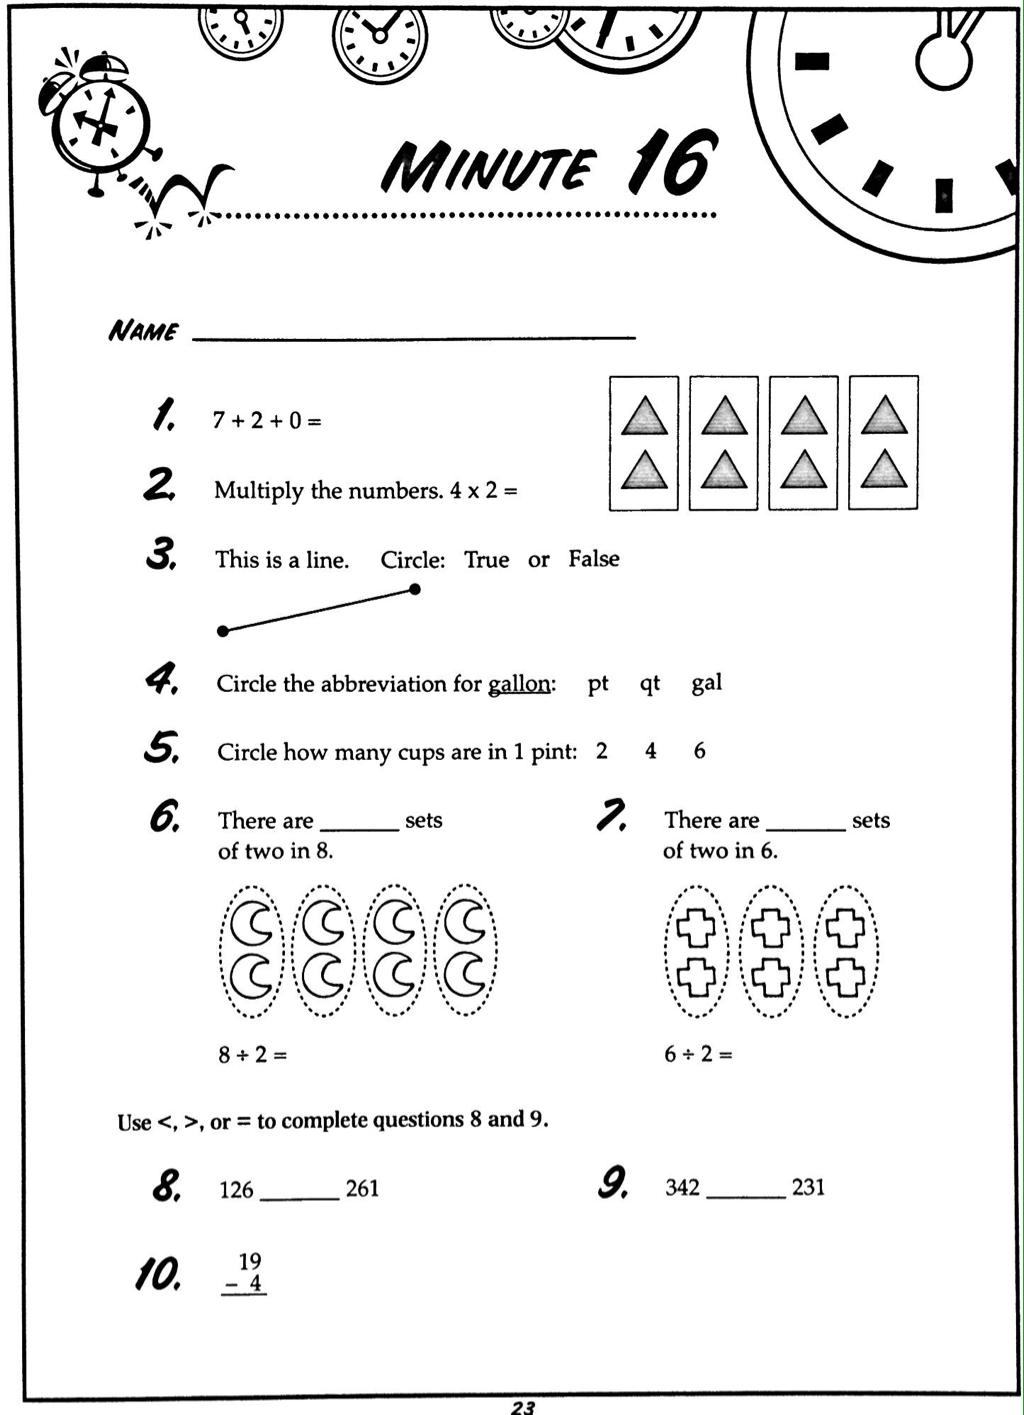 Math Minute 16